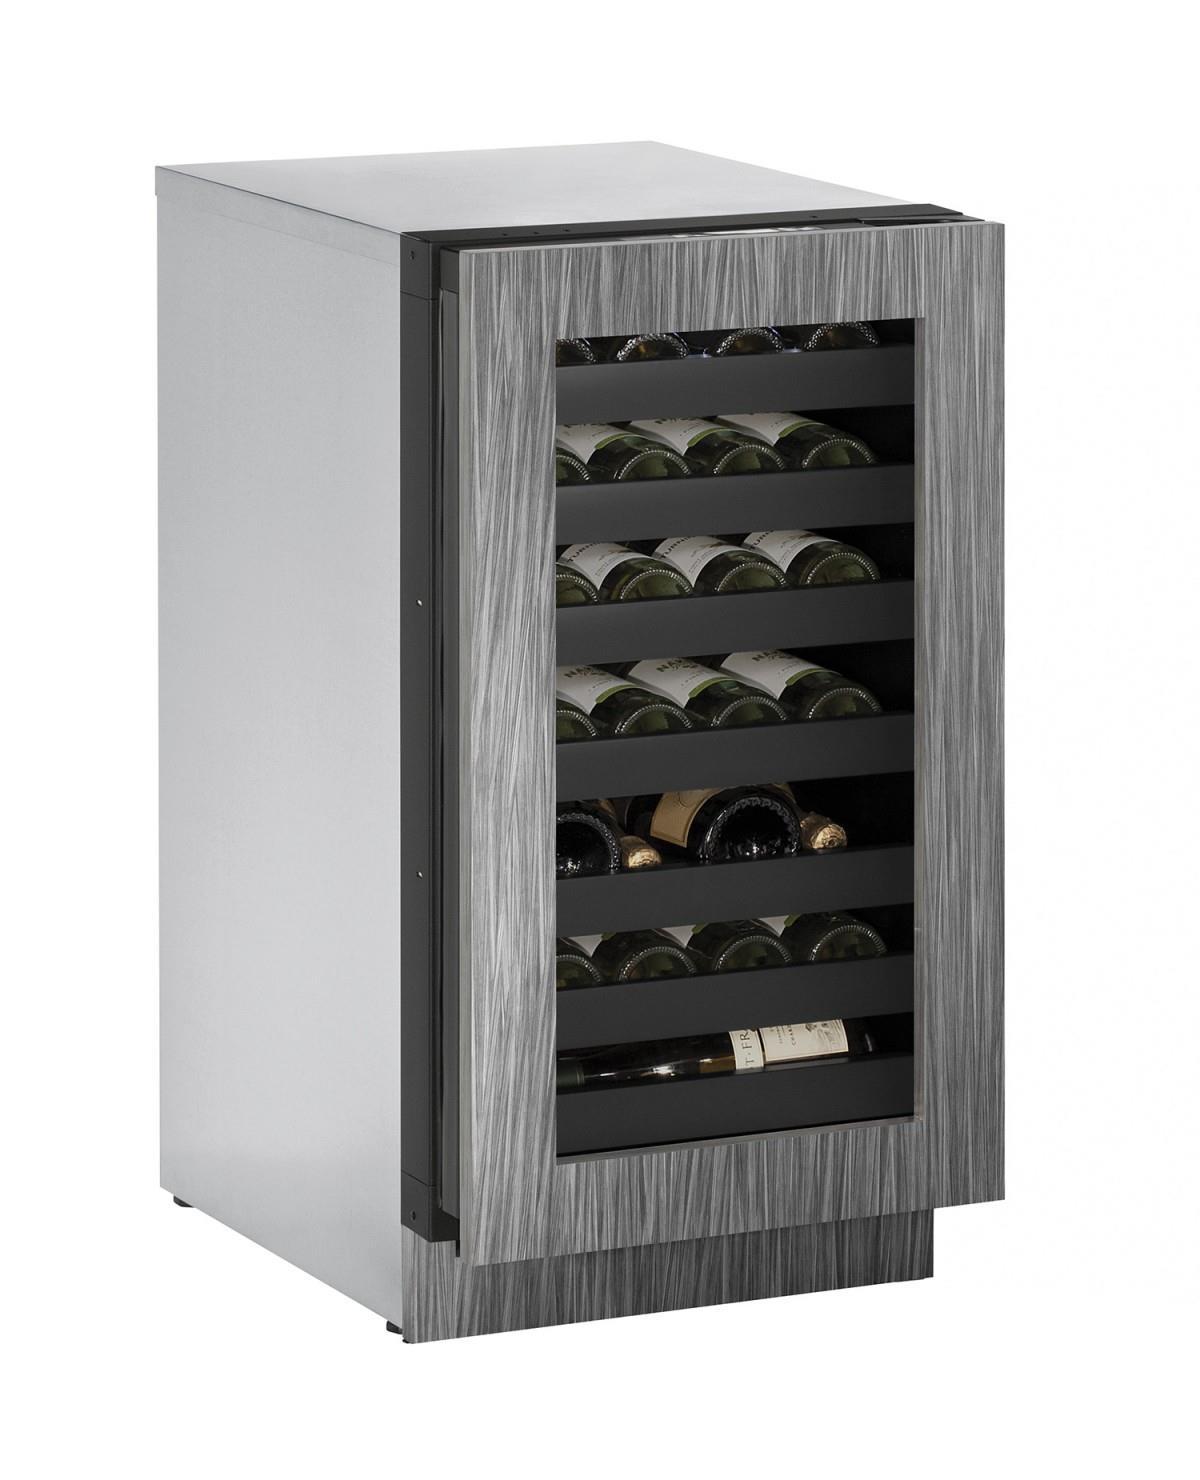 "U-Line Wine Captains 3.6 Cu. Ft. 18"" Built-In Wine Storage - Item Number: U-3018WCINT-01A"